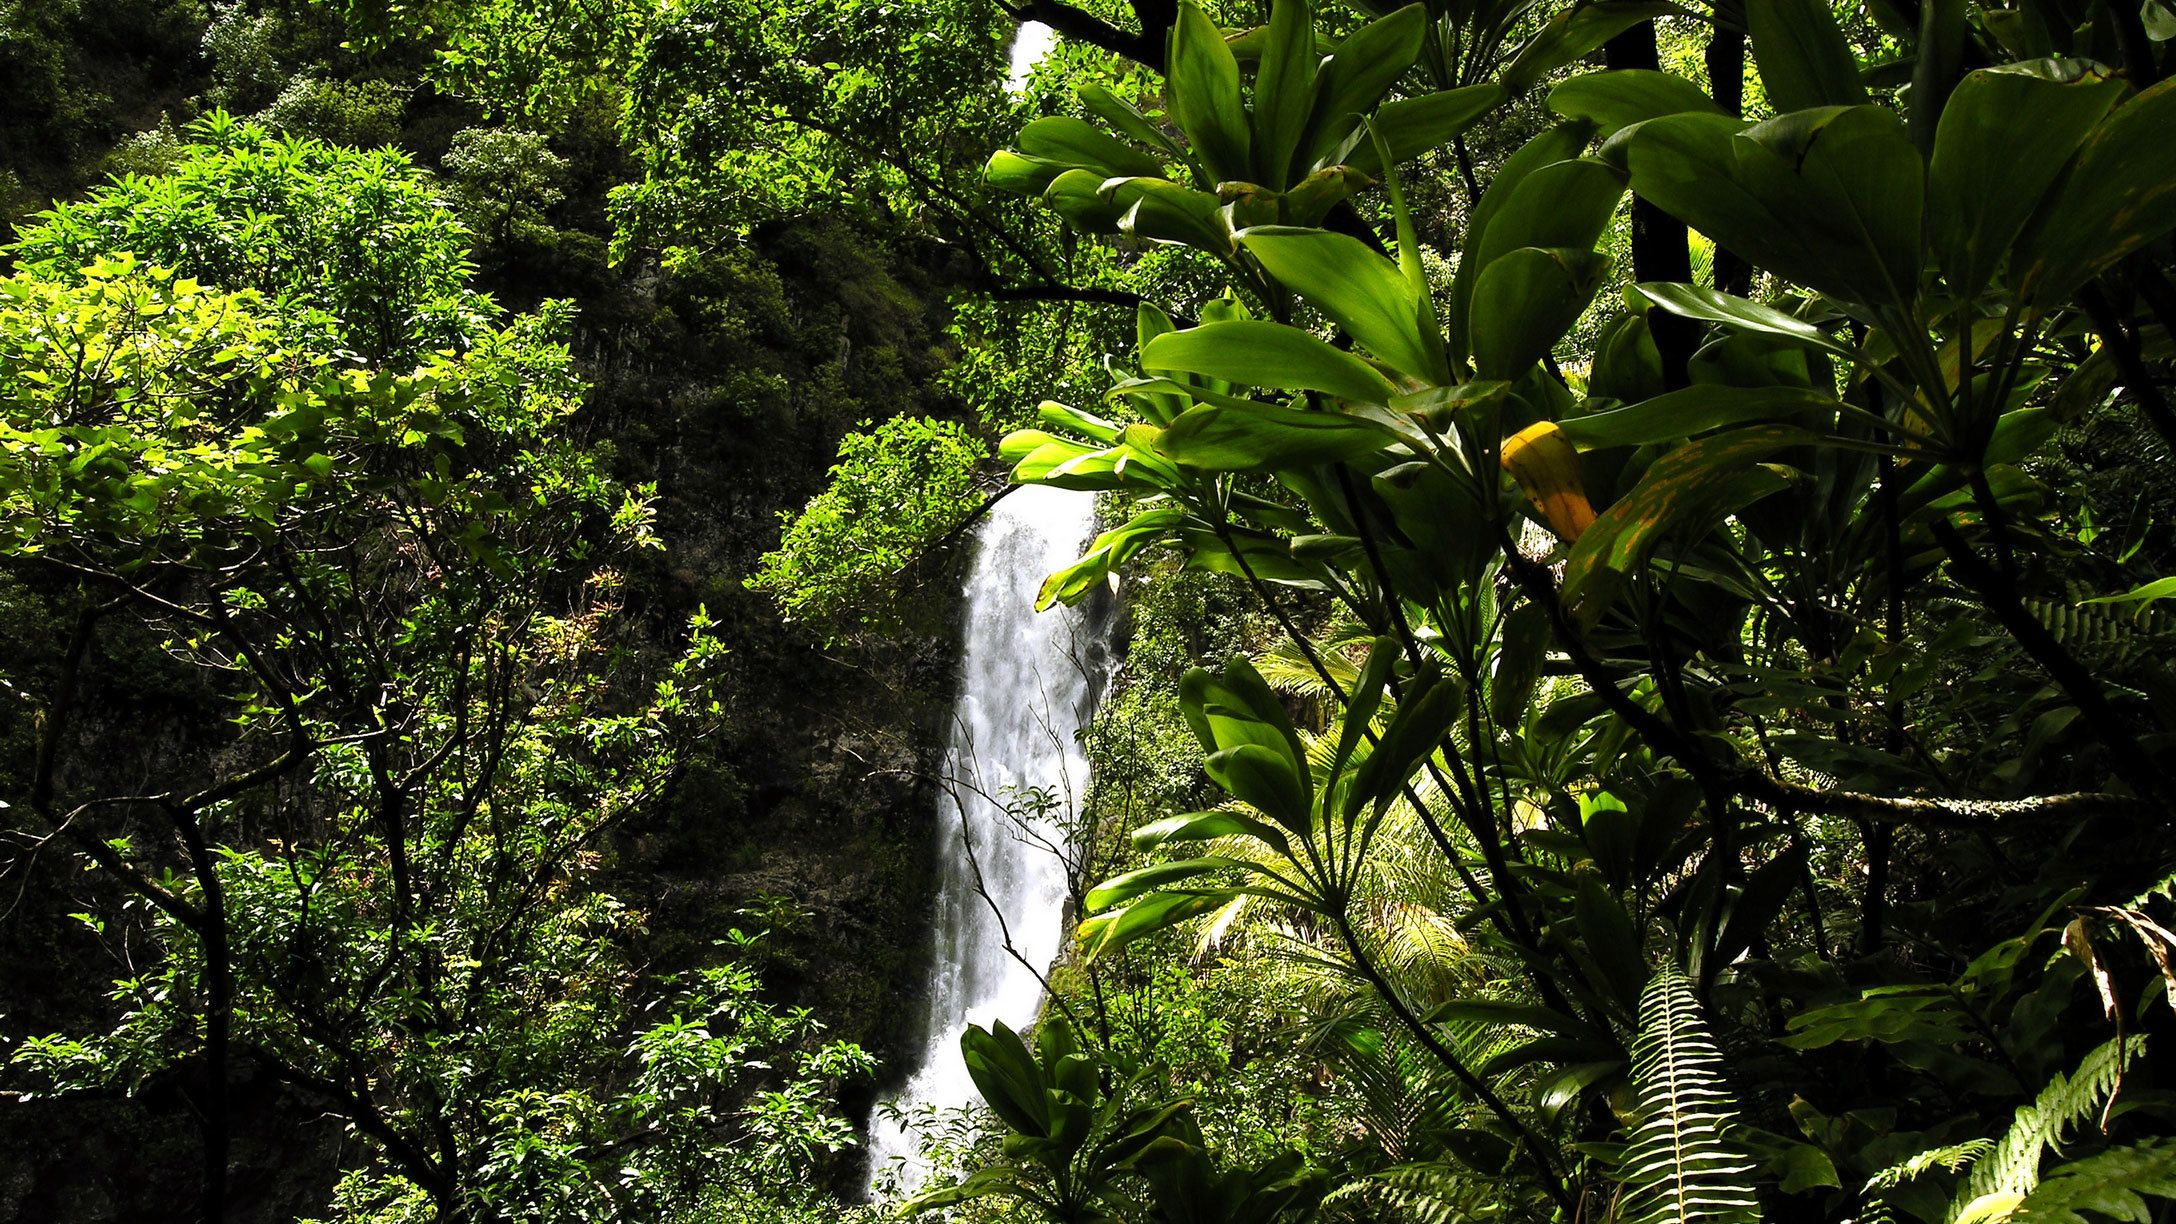 Waterfall in Hana rainforest in Maui